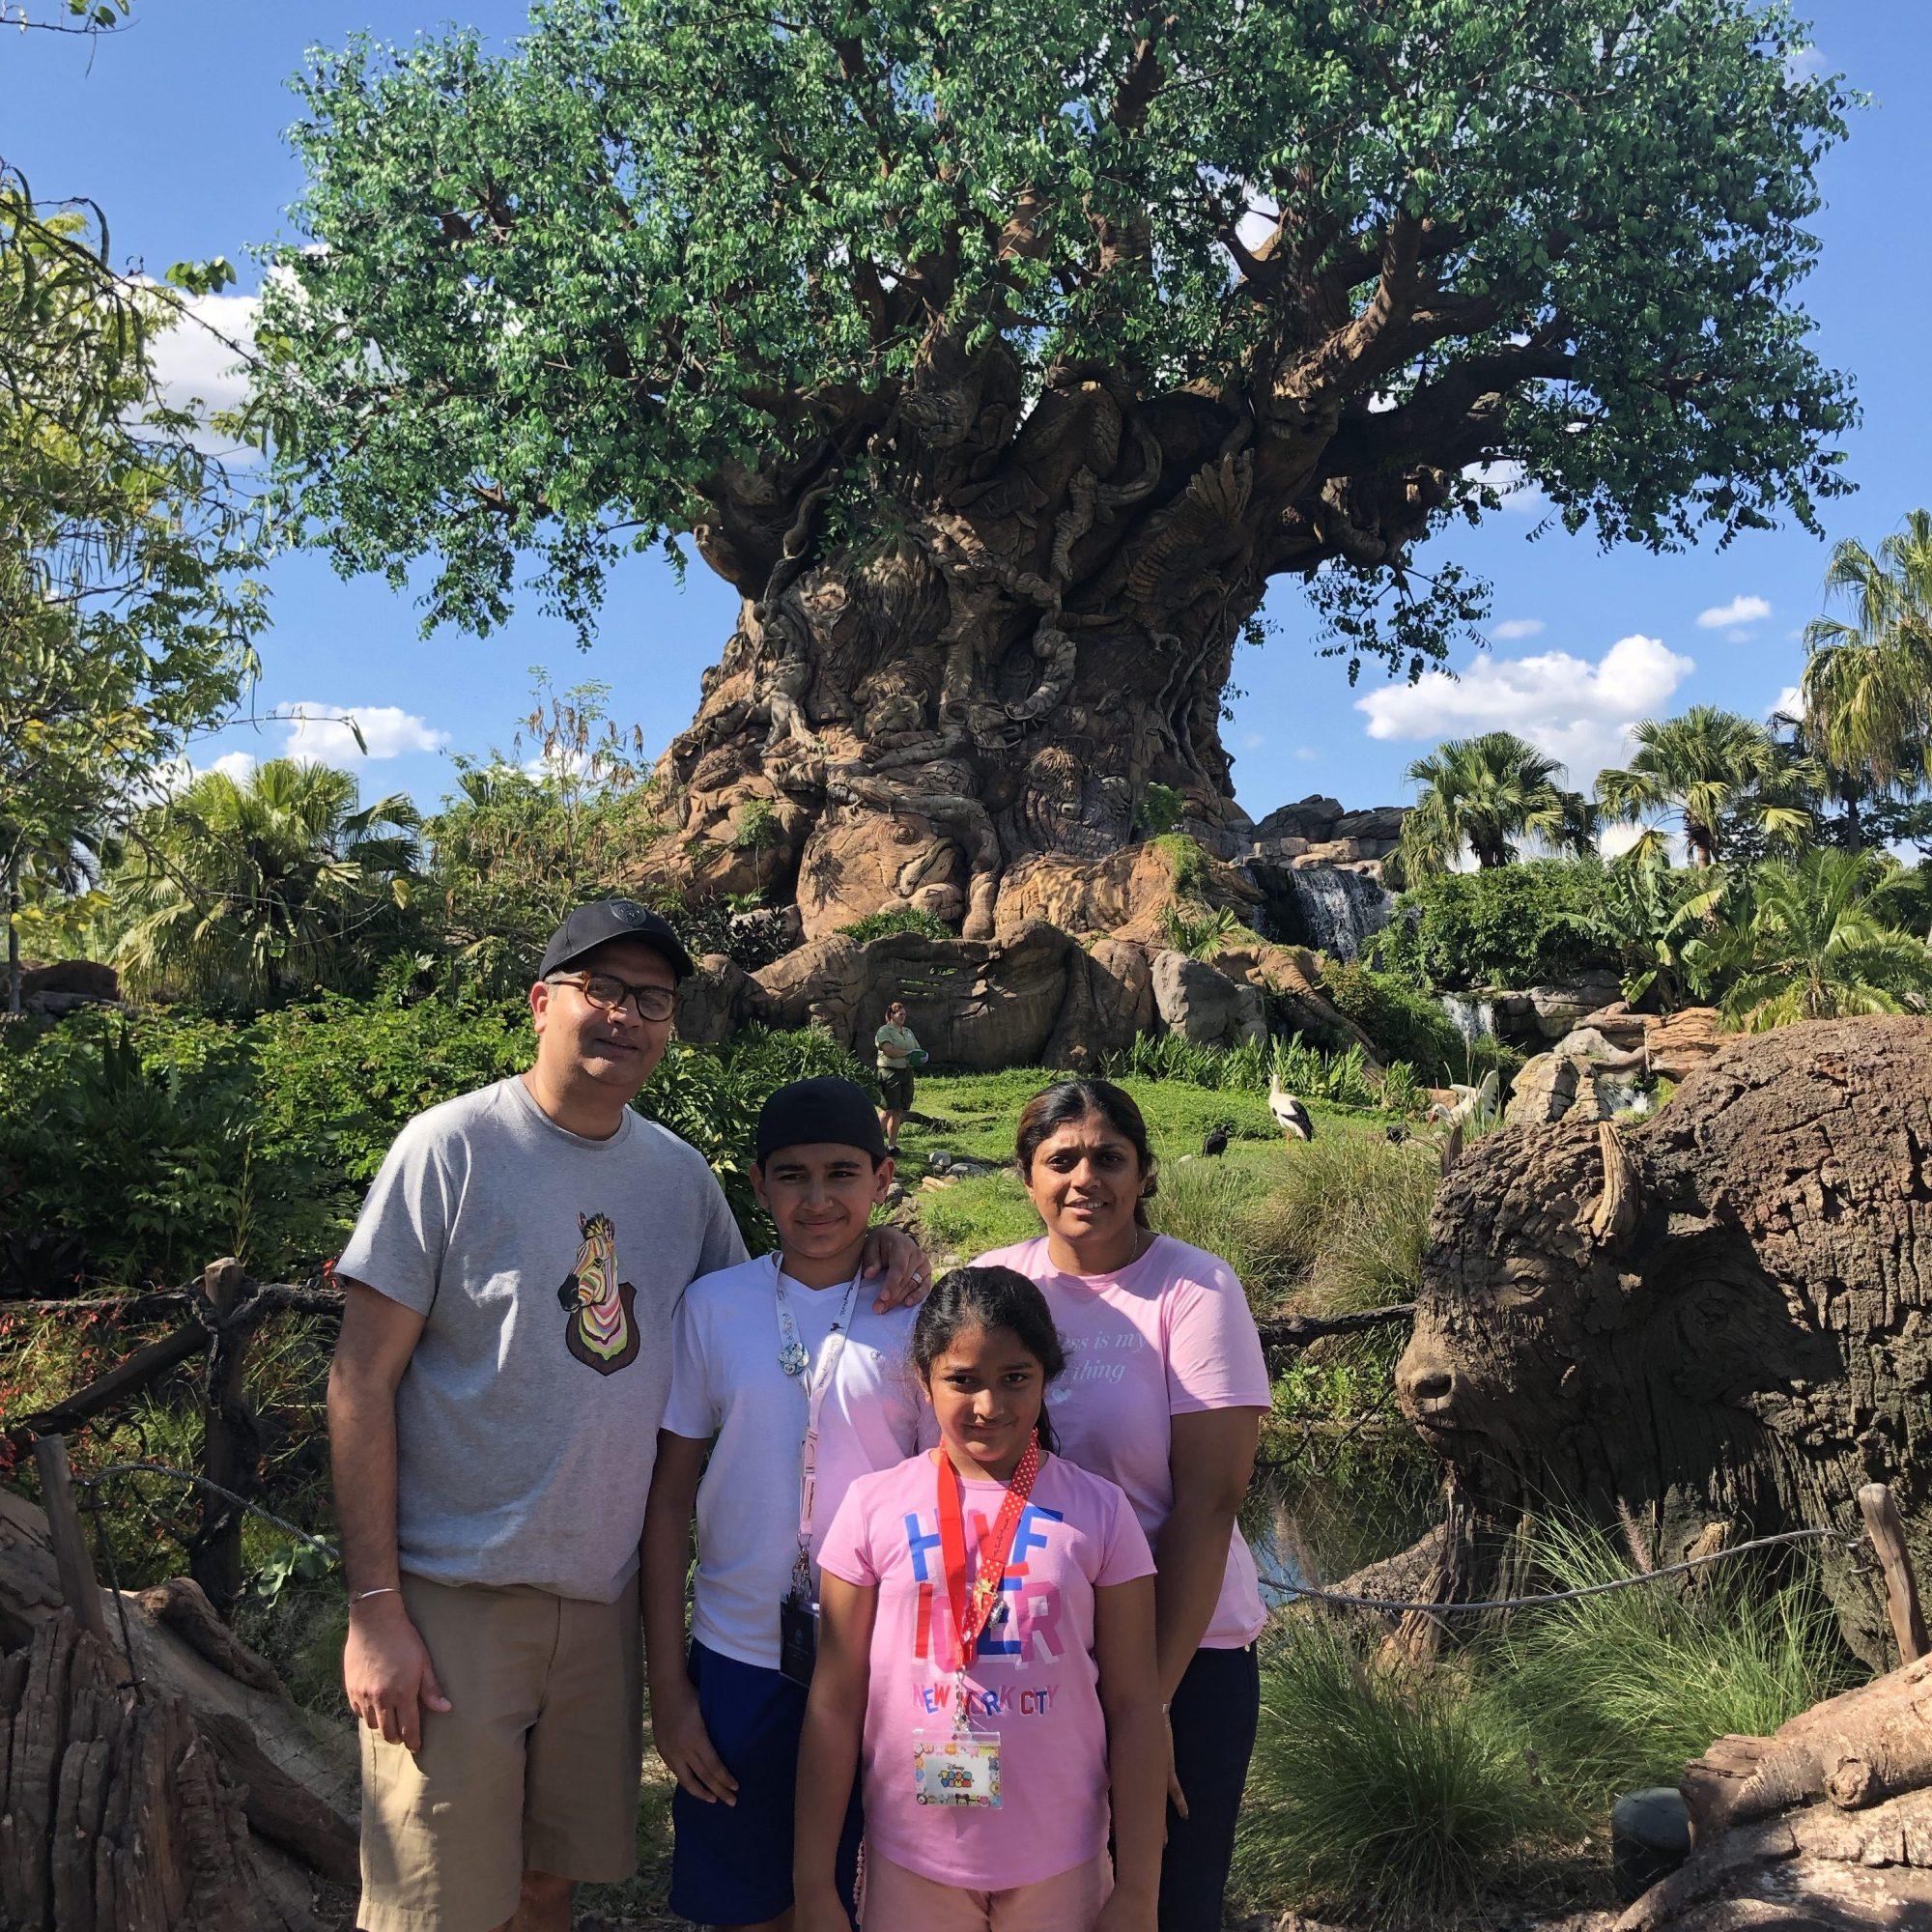 Disneyland first time - Best time to visit Disneyland.